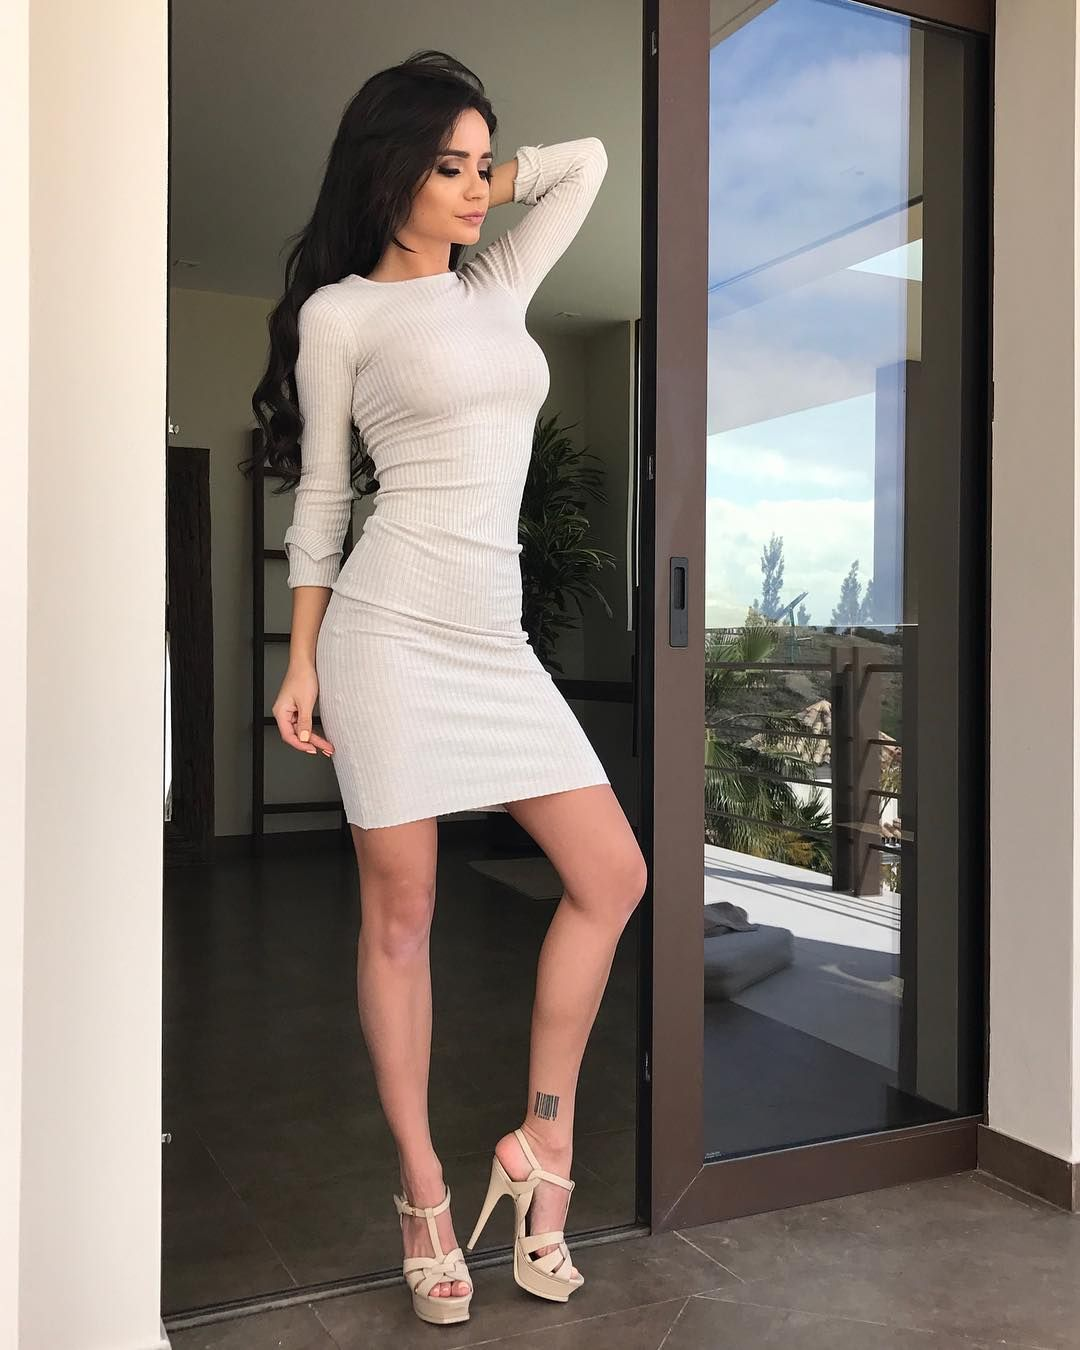 Selfie Ekaterina Zueva nude (59 pics), Paparazzi